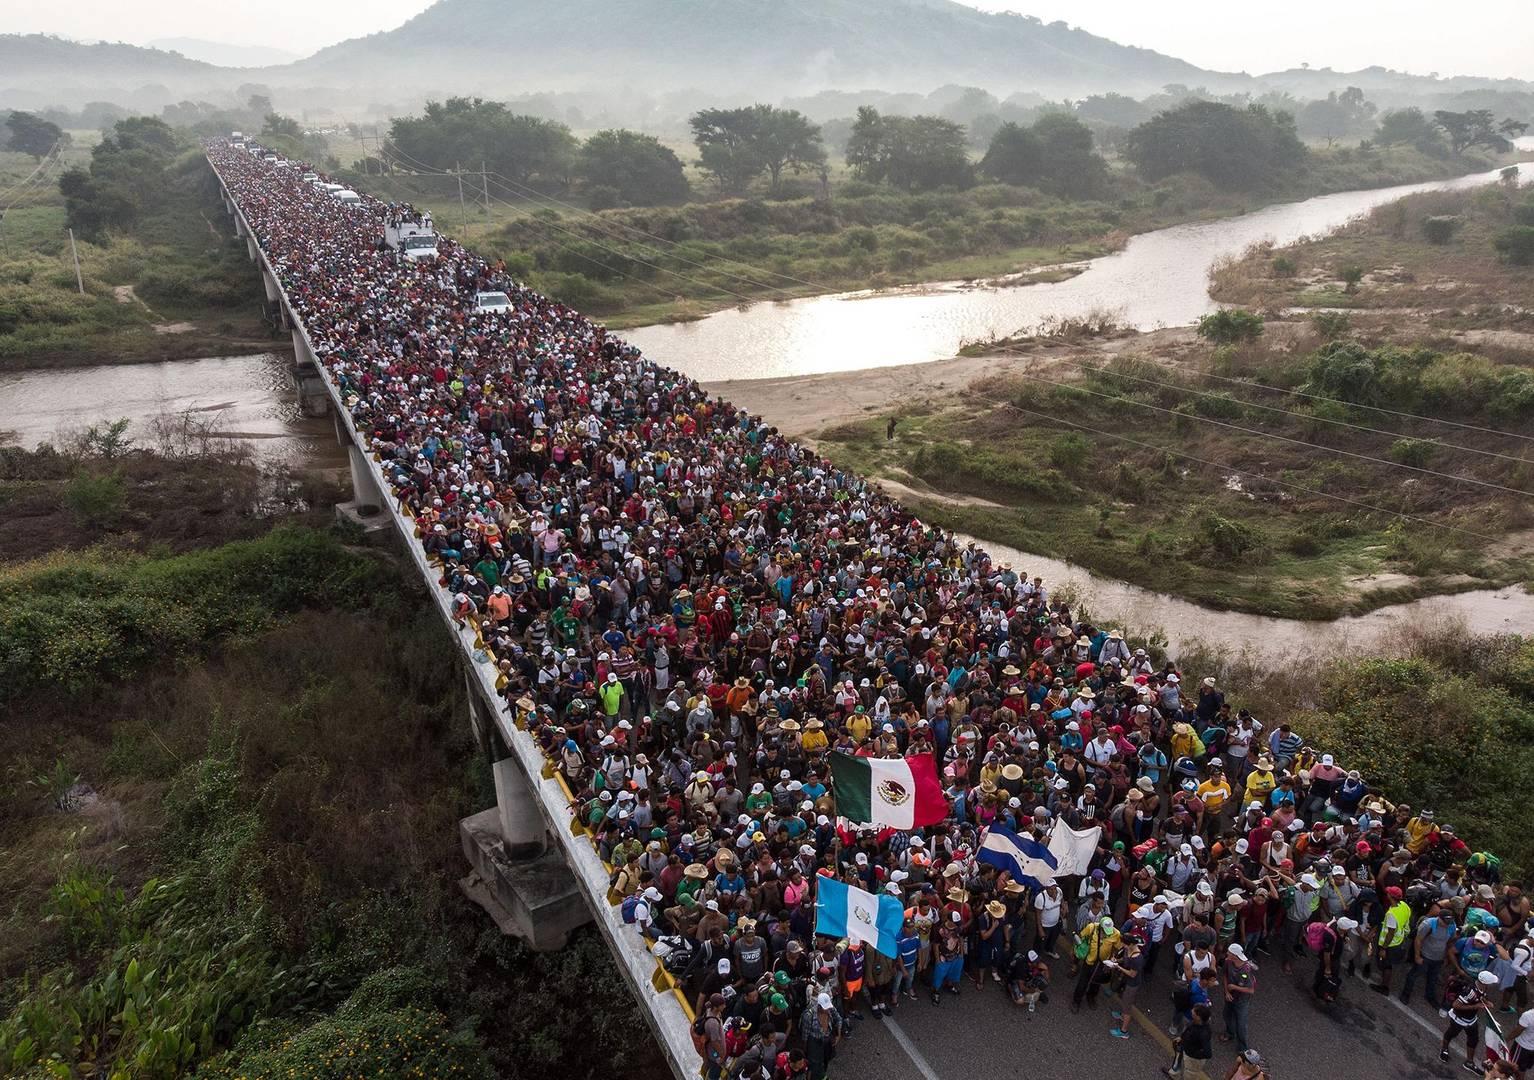 «Караван мигрантов» на юге Мексики. Октябрь 2018 г.